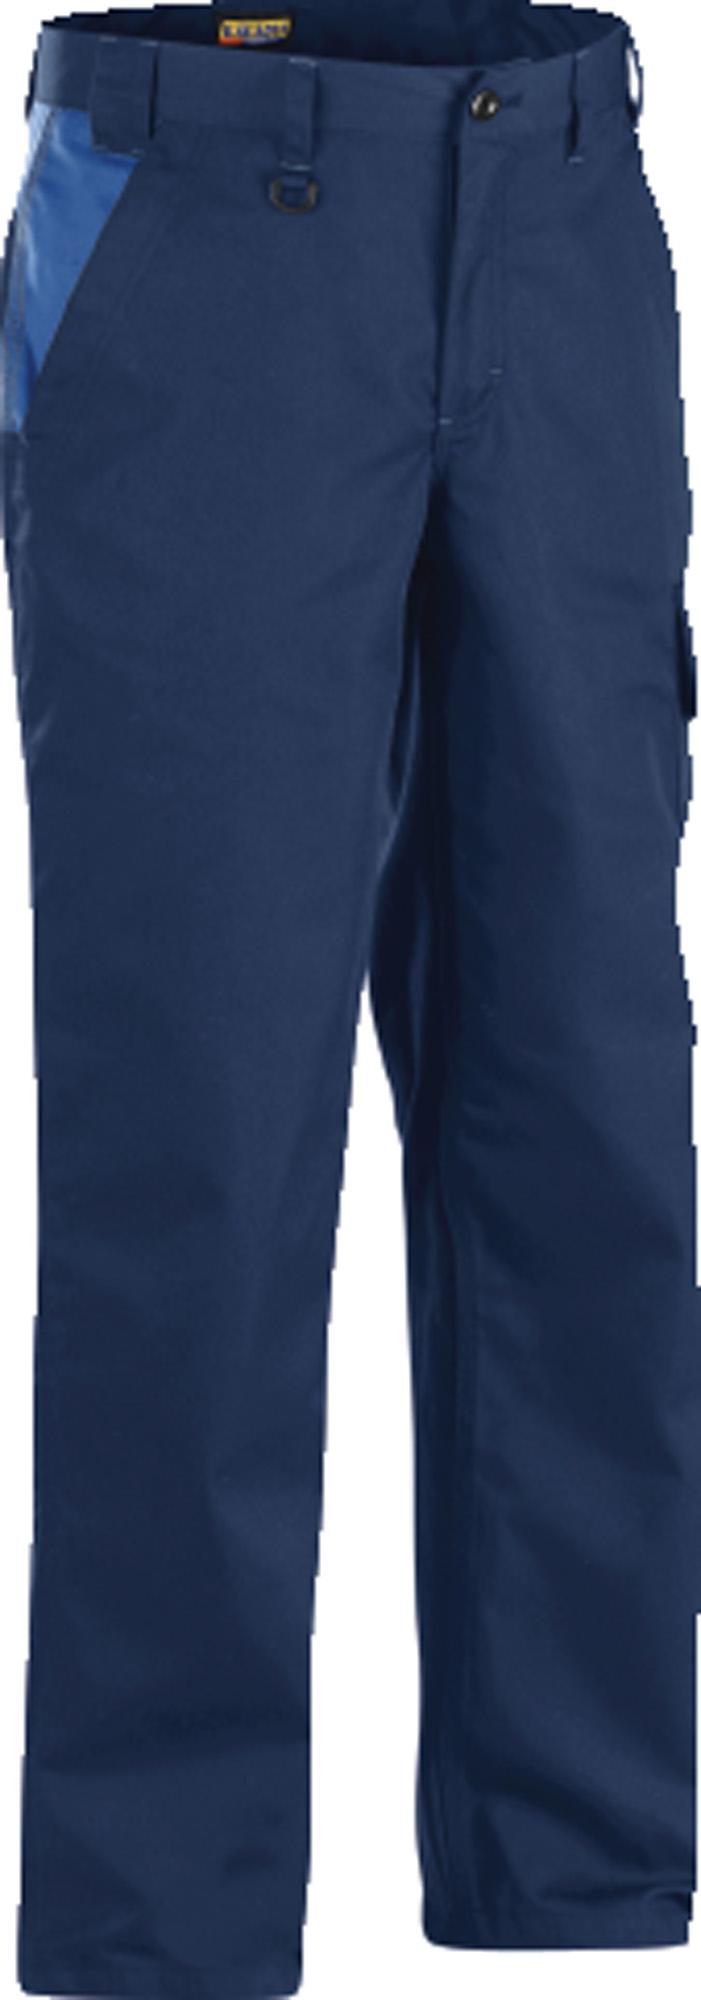 Blaklader De 1210 Industrie Cotton Travail Multi 1404 Poche 100 Pantalon 4qAUSnx4